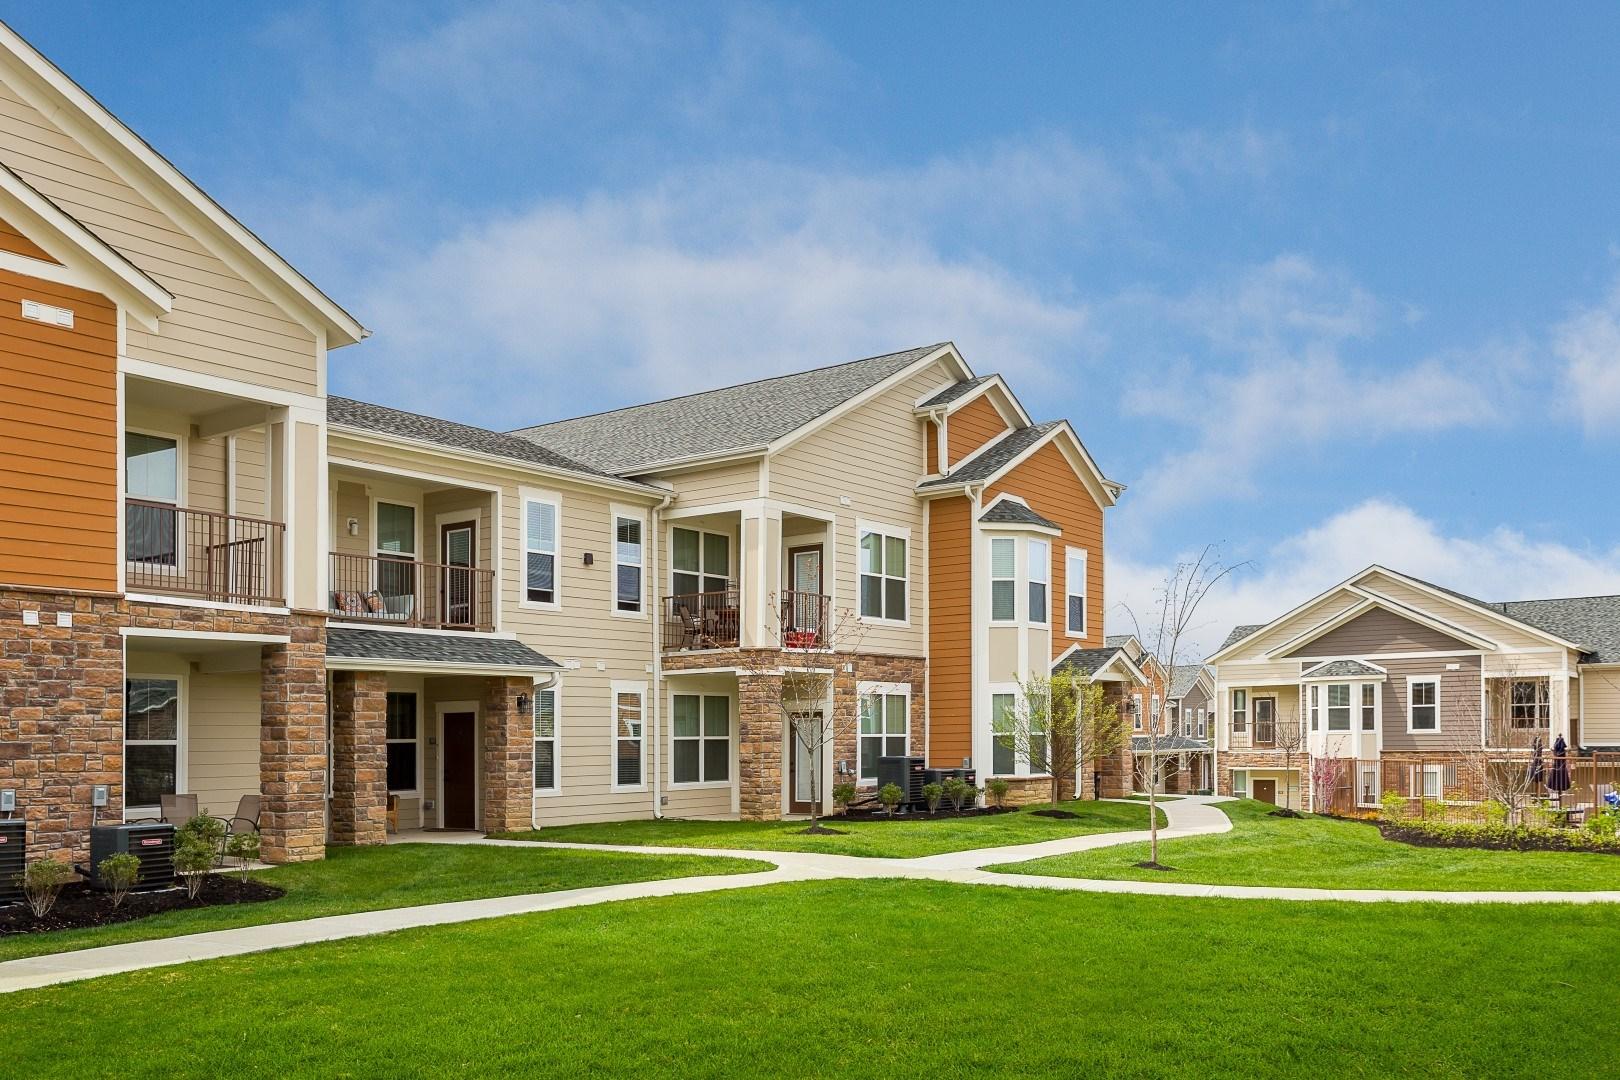 exterior apartments in louisville